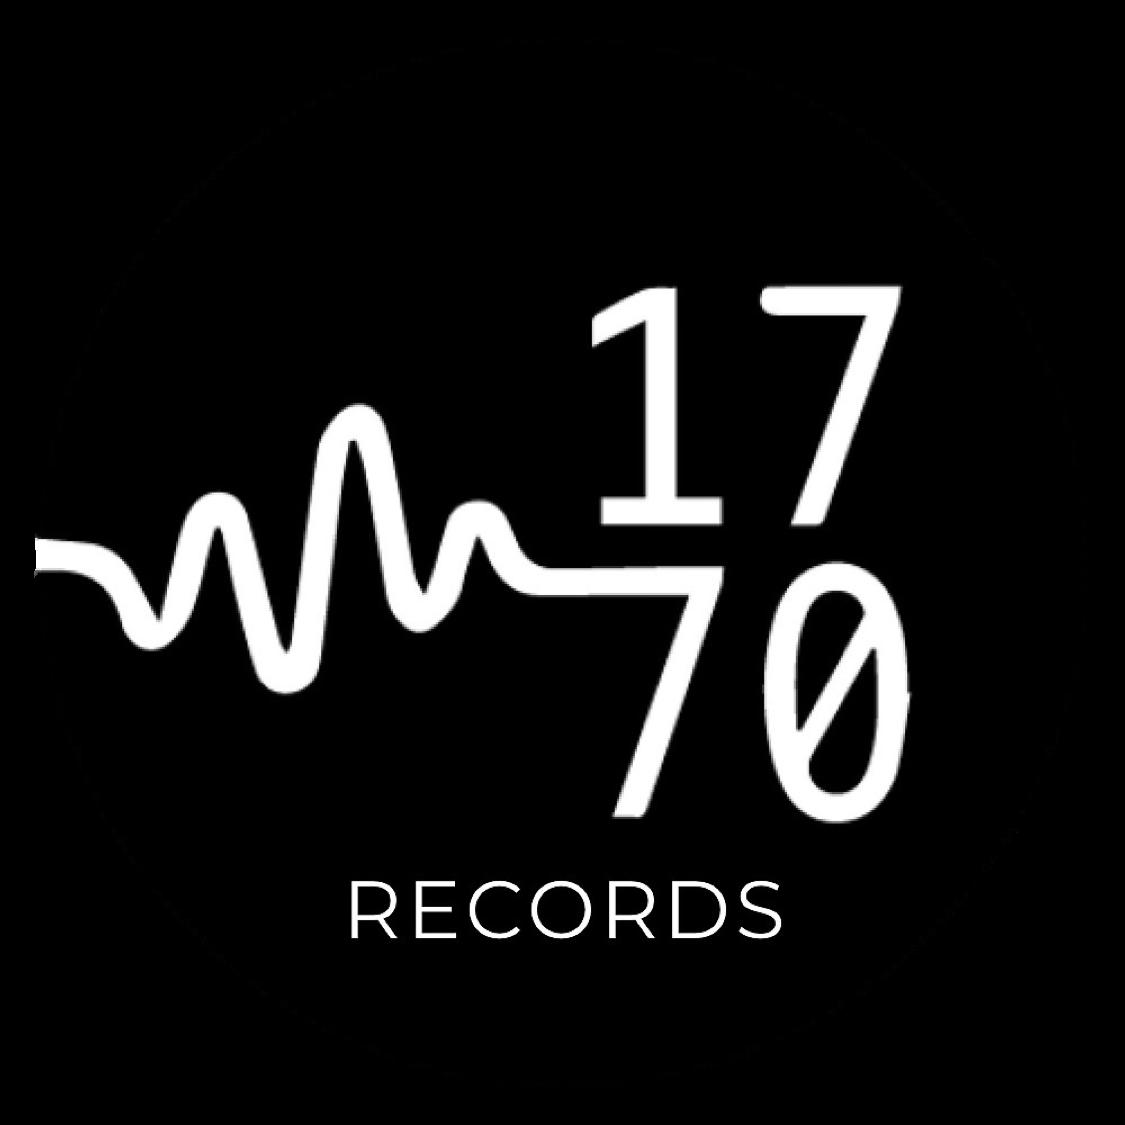 1770 Records